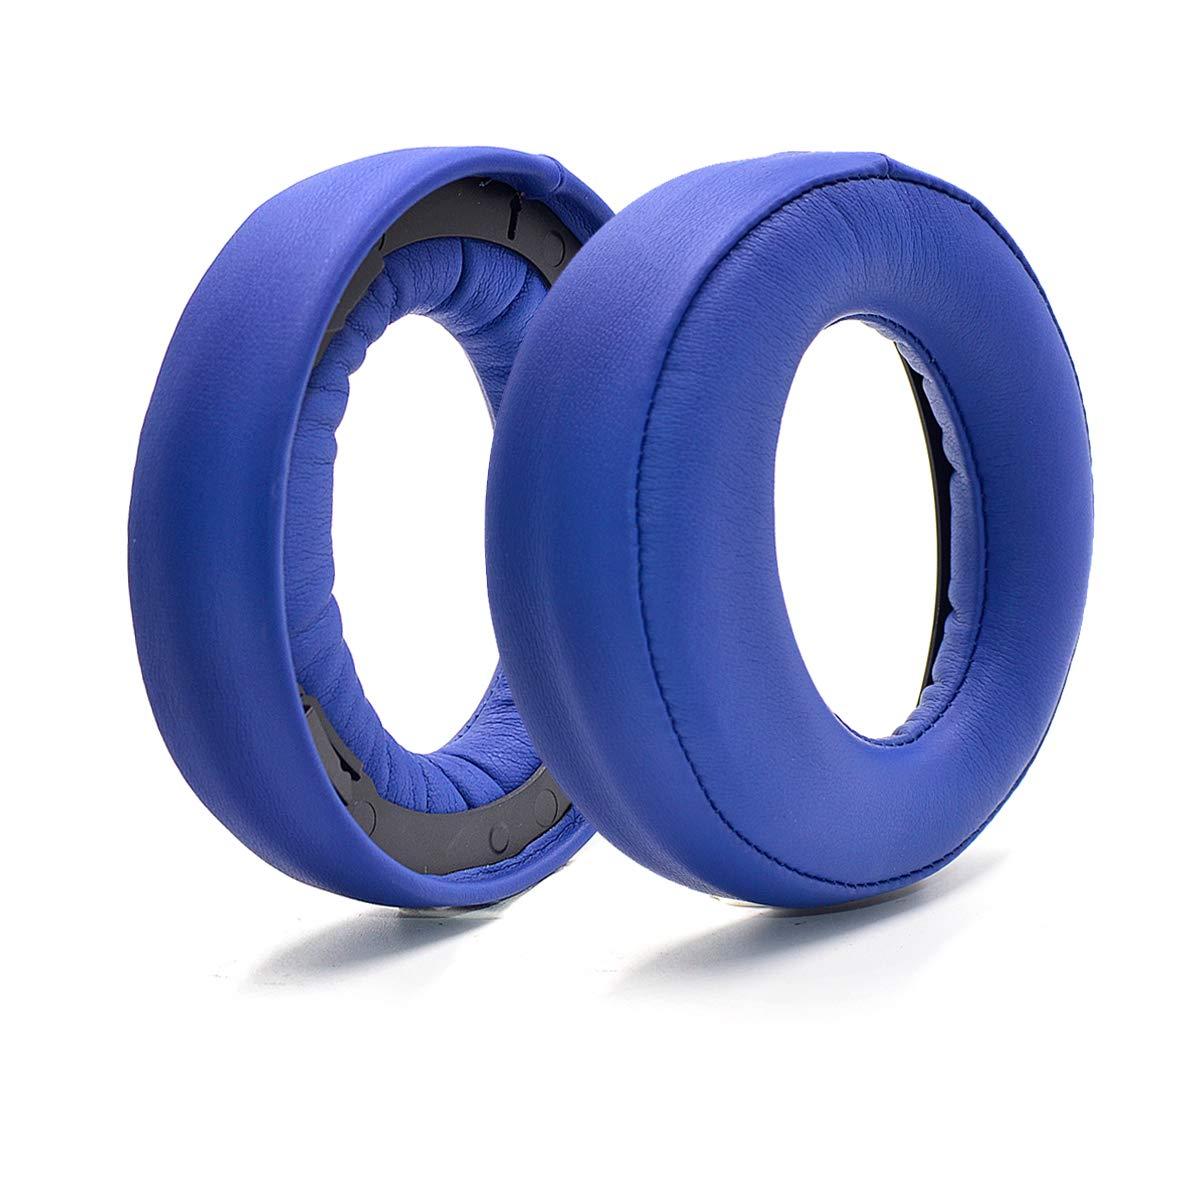 Almohadillas Auriculares Ps3 Ps4 Gold Cechya-0083 azules